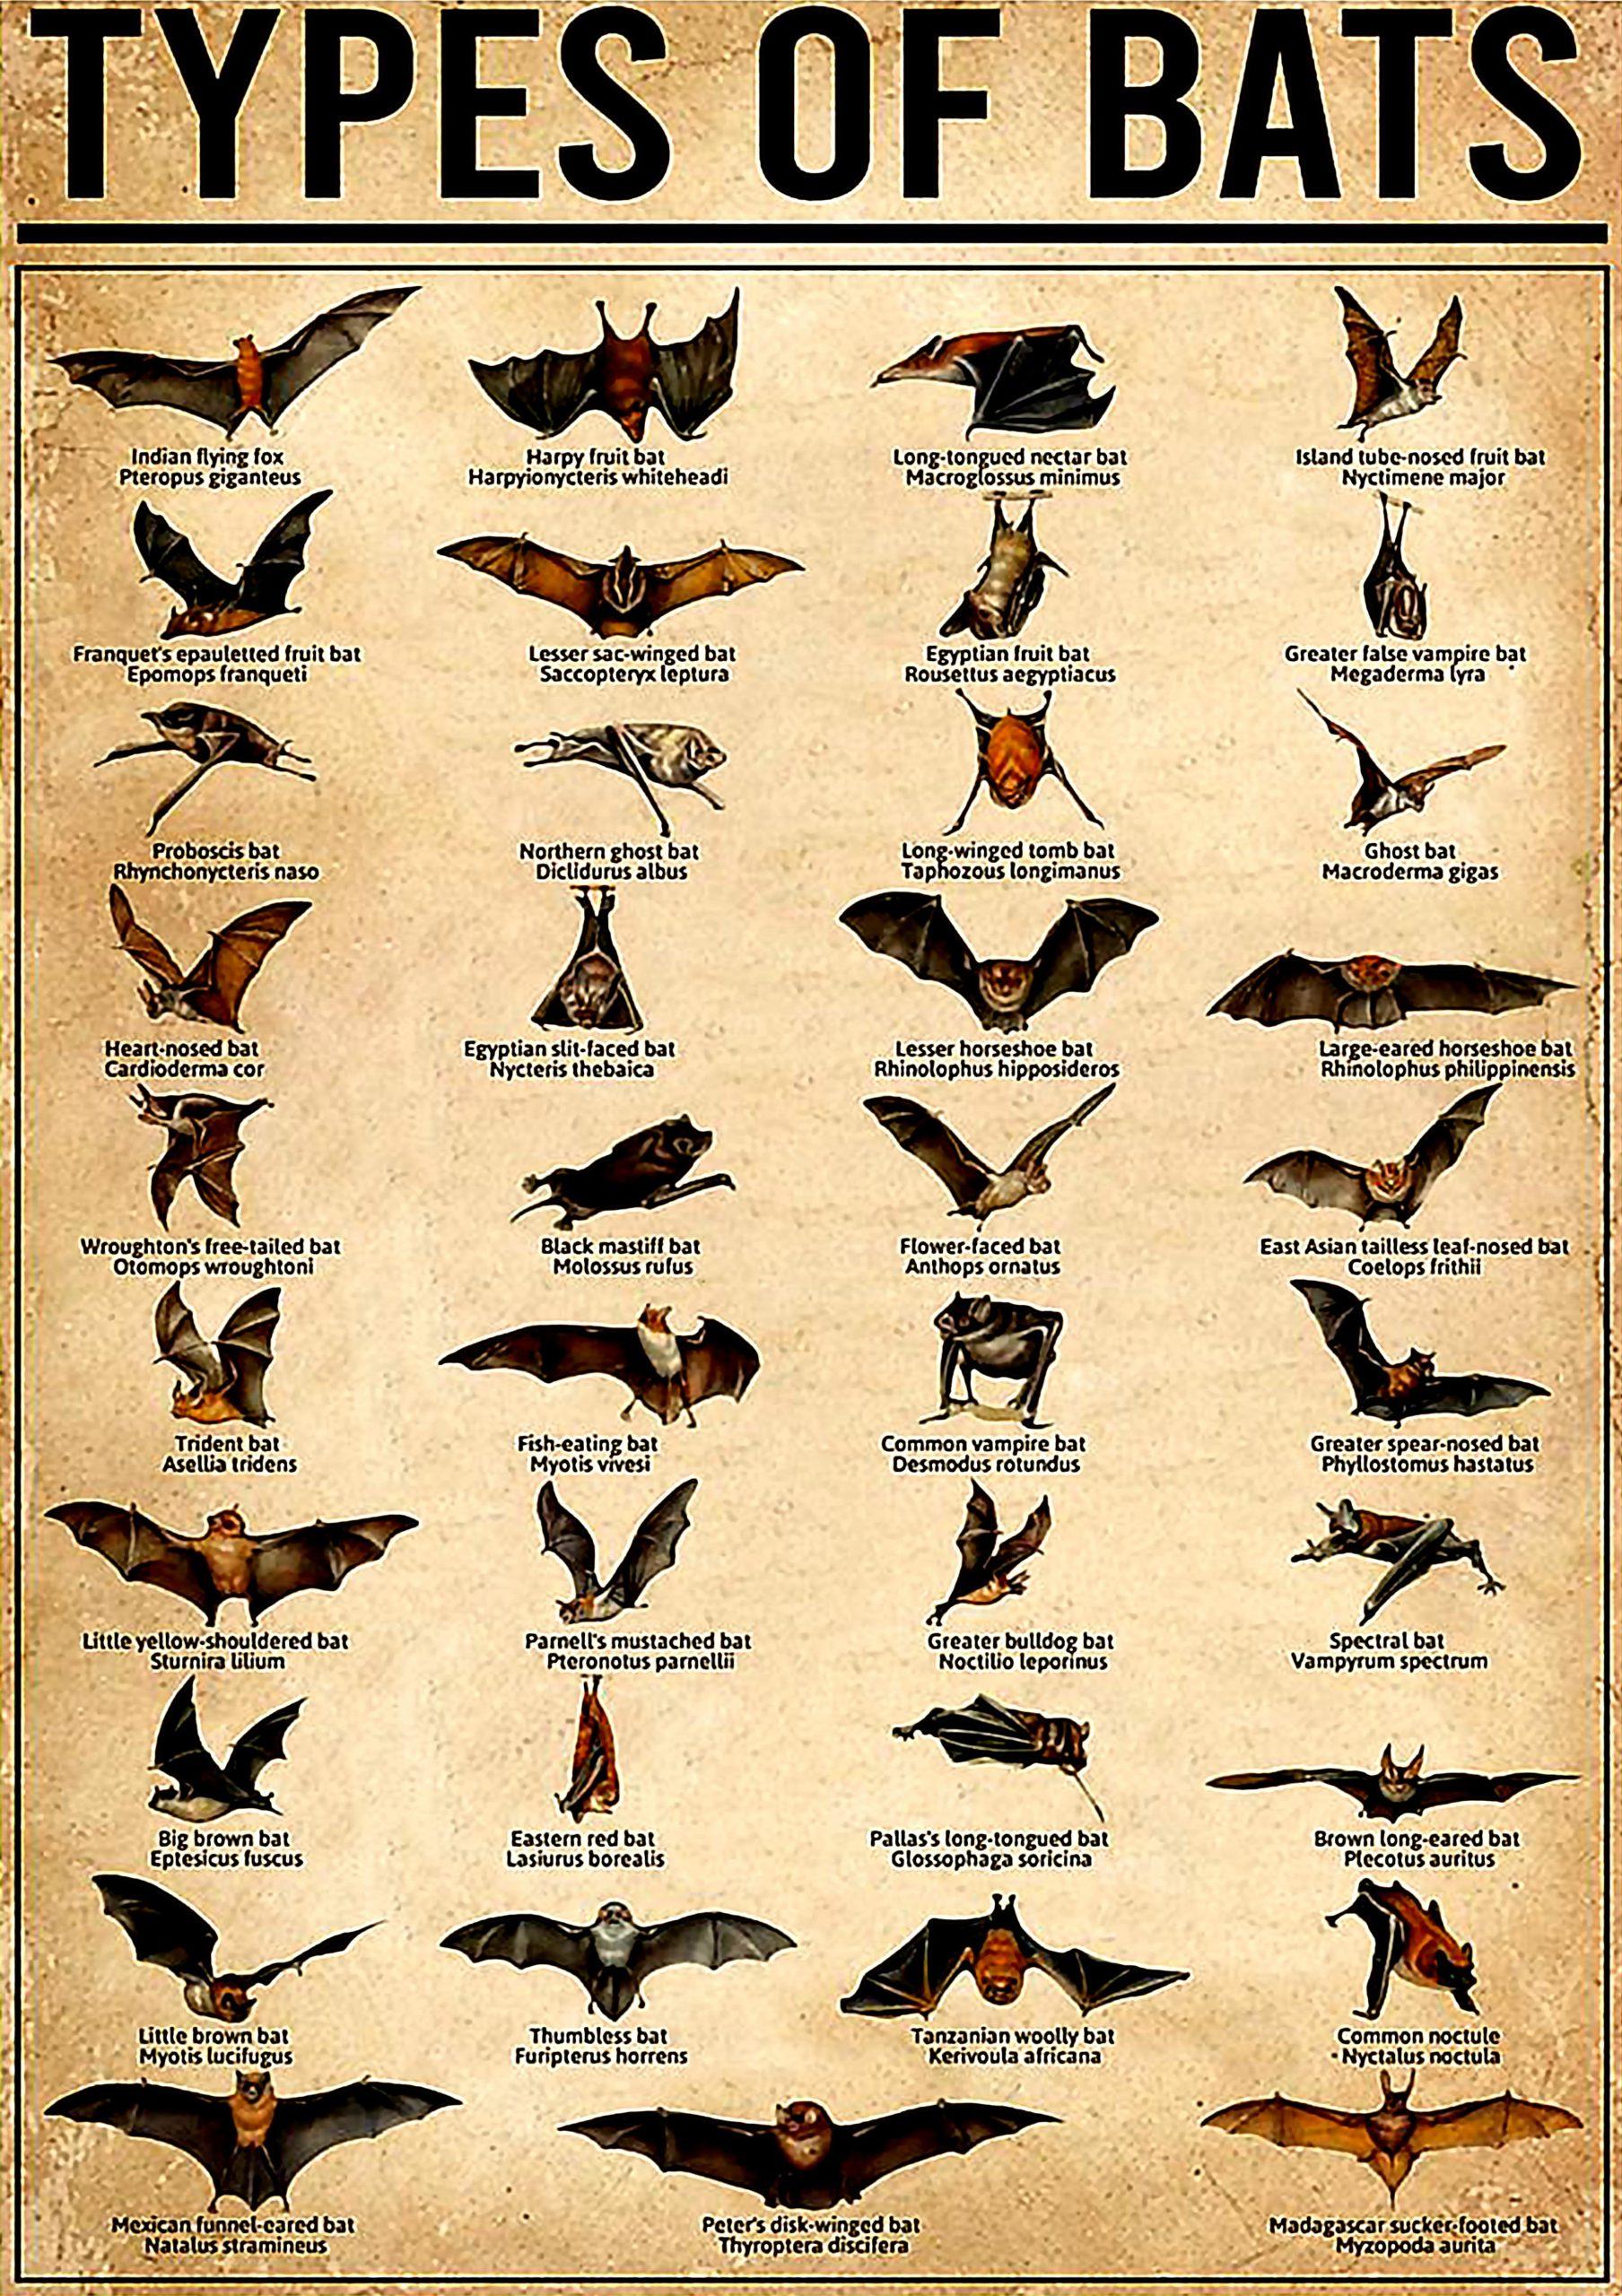 vintage types of bats poster 1 - Copy (2)